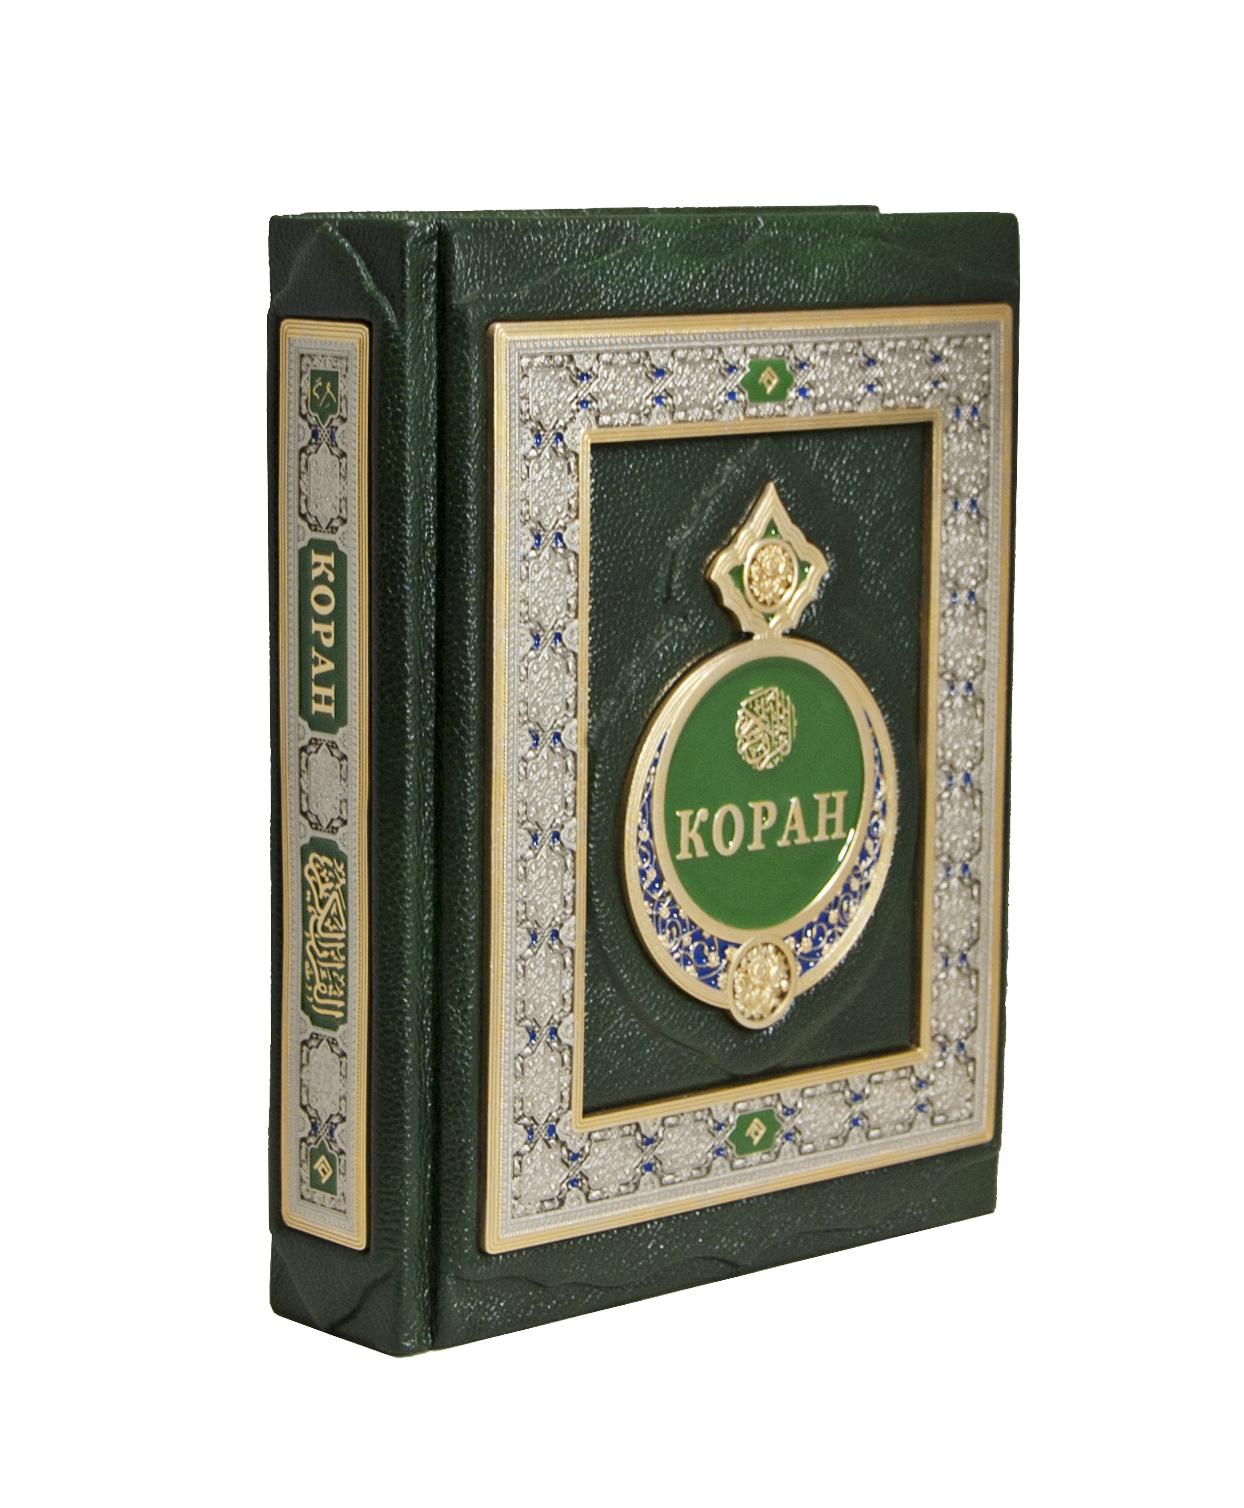 Коран.__Перевод_и_комментарии_М.-Н._О._Османова_._______________2_.jpg